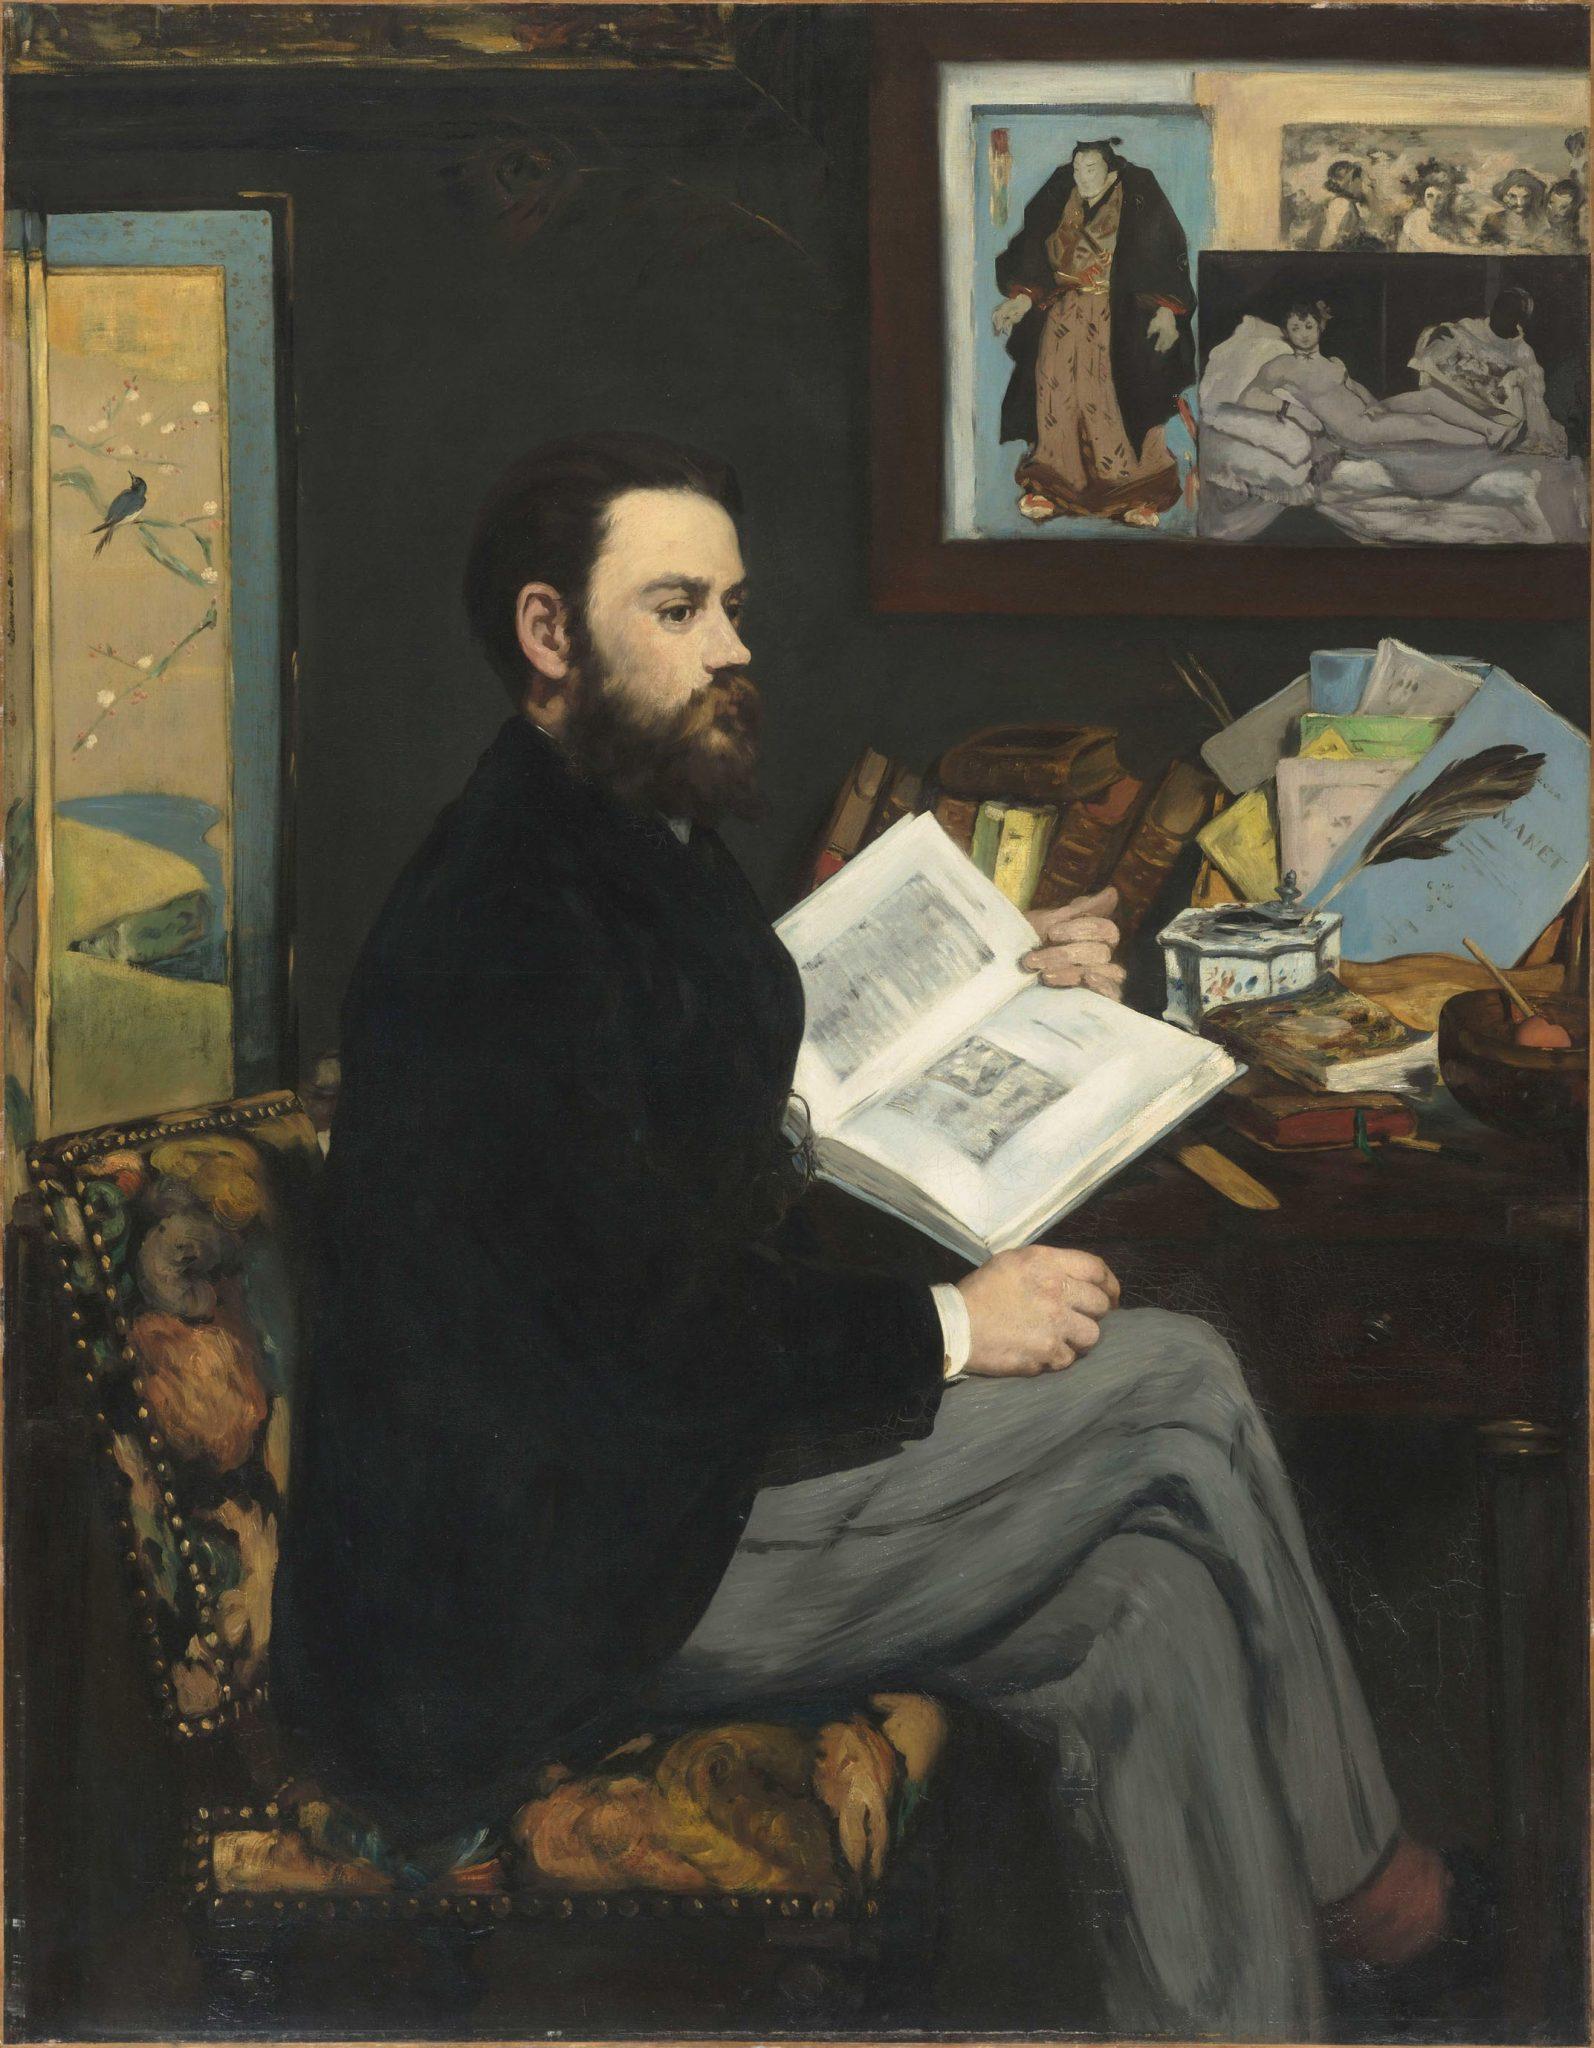 Edouard Manet Ritratto di Émile Zola, 1868 Olio su tela, 146 x 114 cm Parigi, Musée d'Orsay